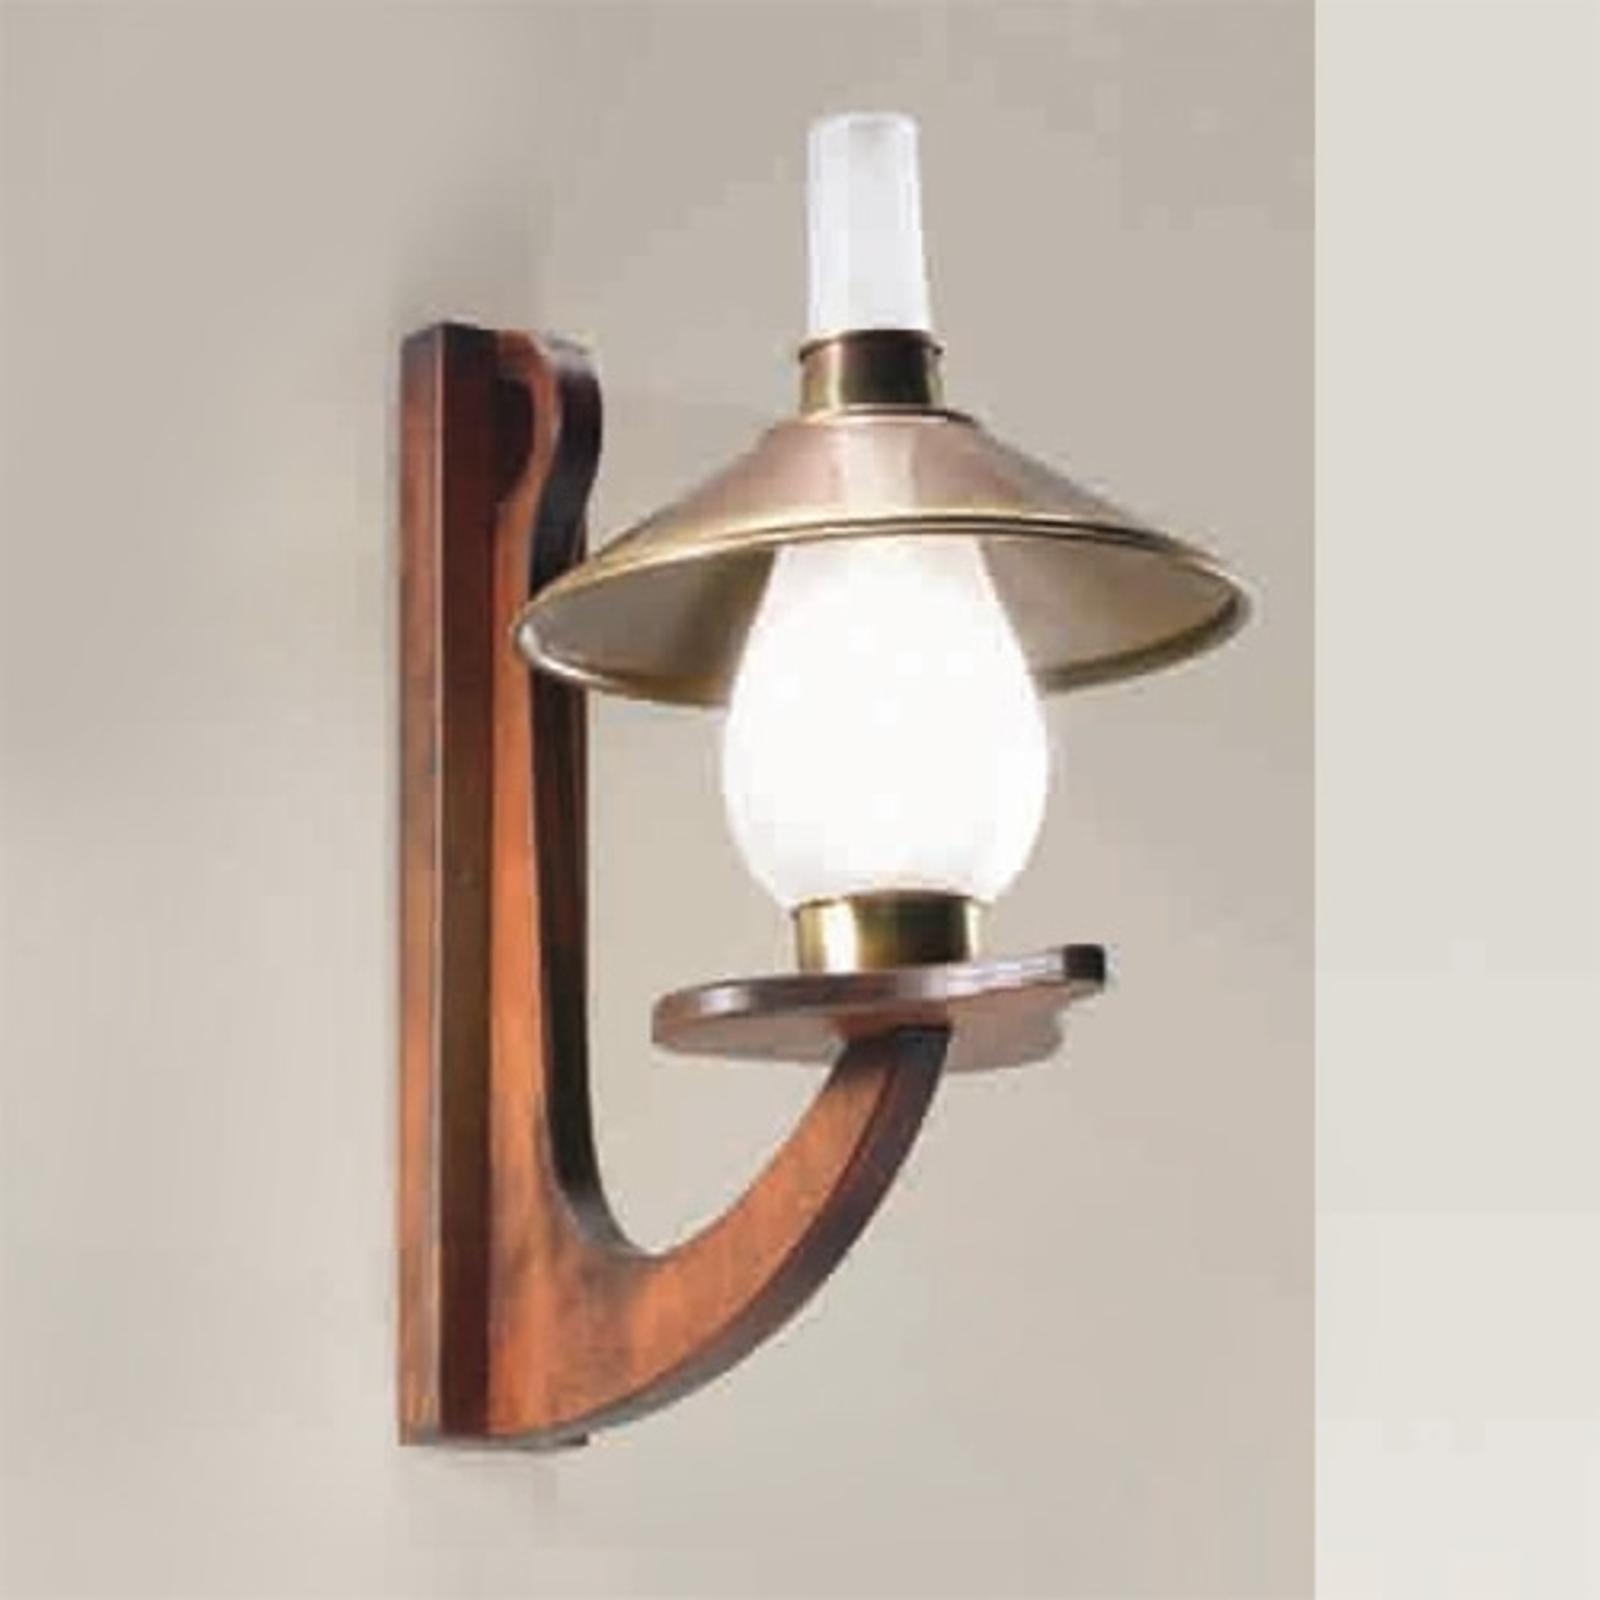 Marea væglampe, 1 lyskilde